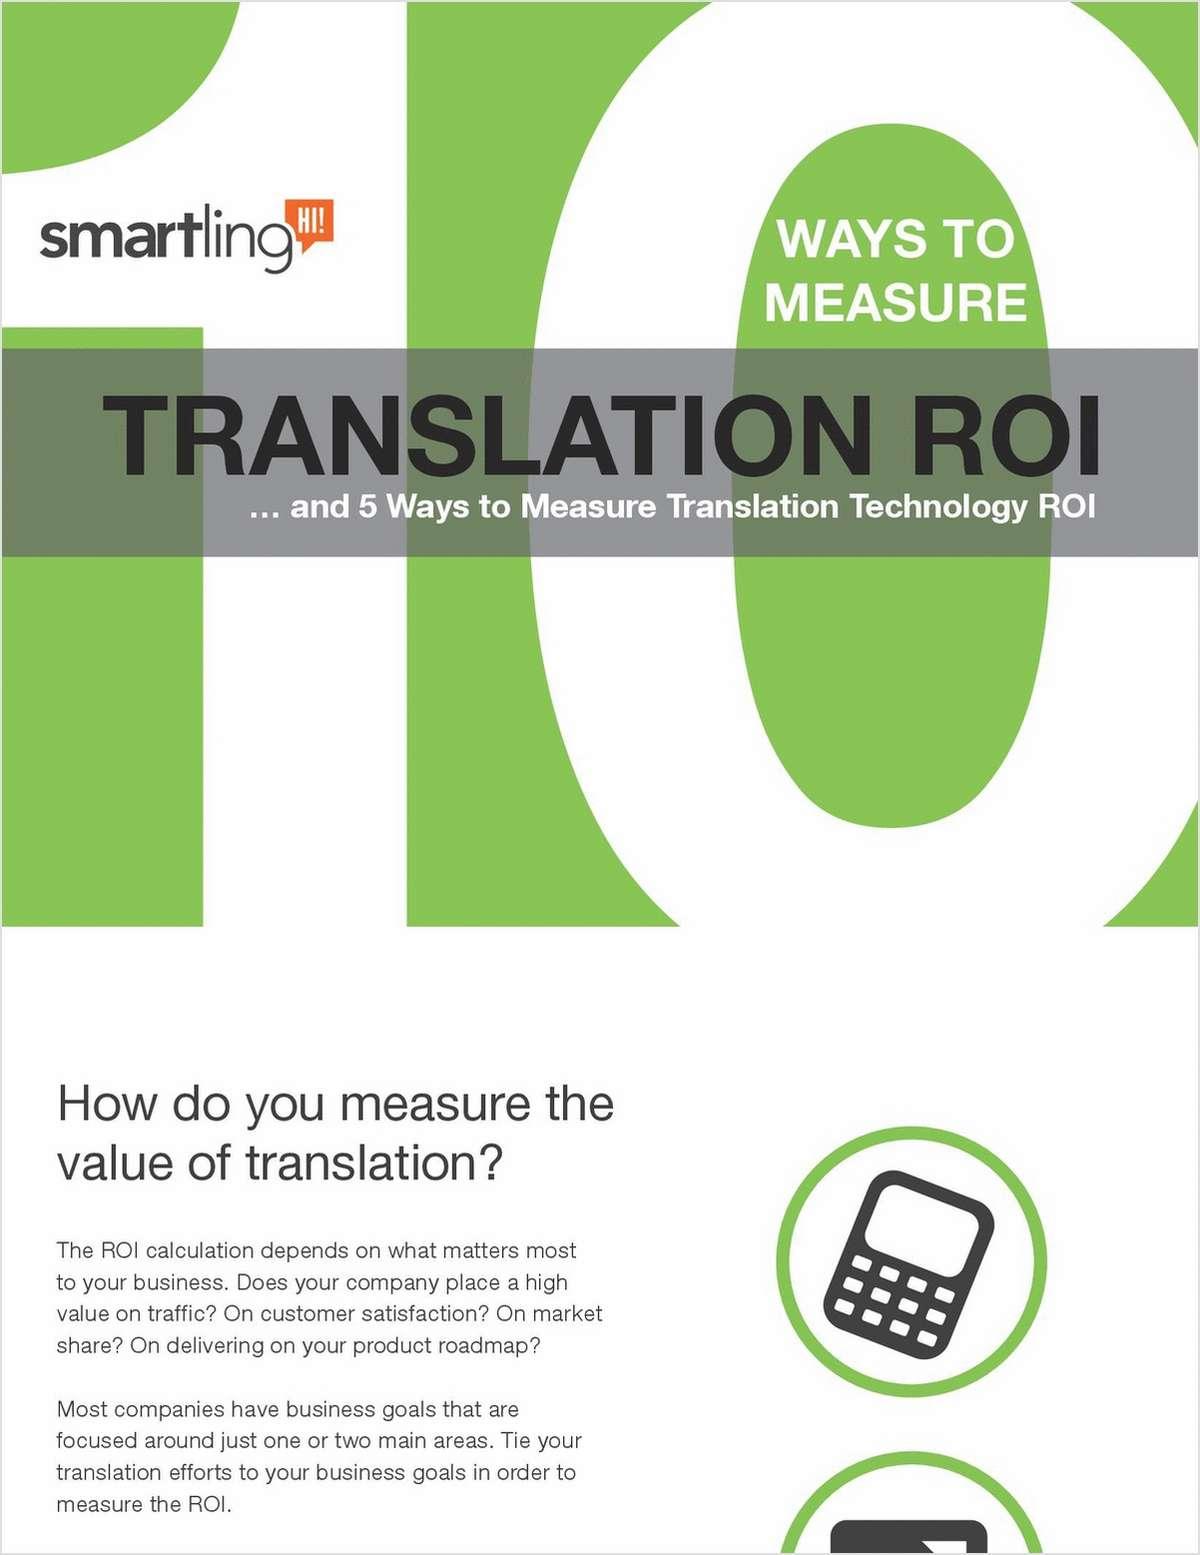 10 Ways to Measure Translation ROI